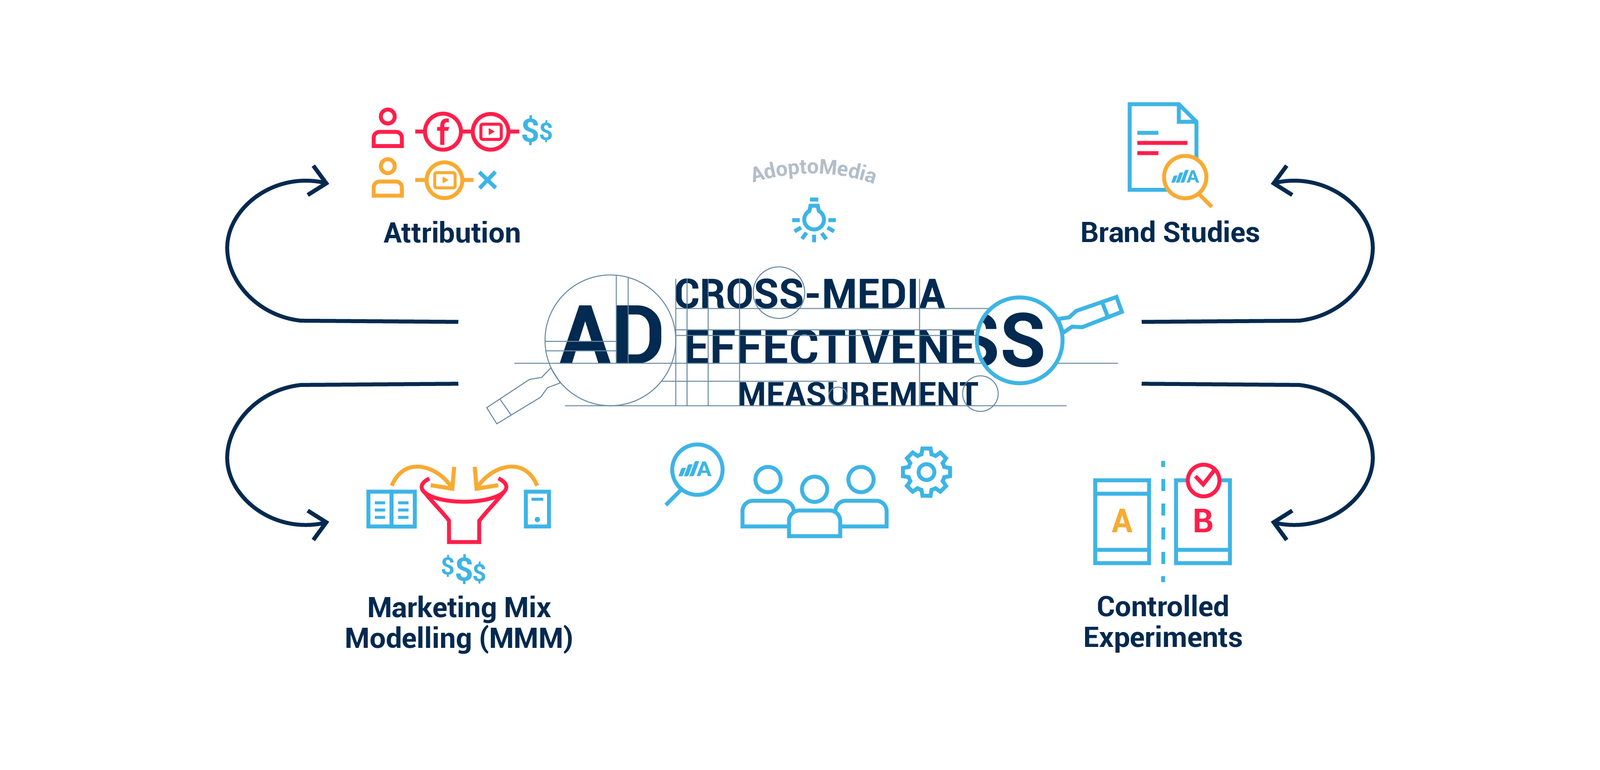 cross-media measurement, cross-platform measurement, ad effectiveness, Attribution, MMM, Marketing Mix Modelling, Brand Studies, controlled experiments